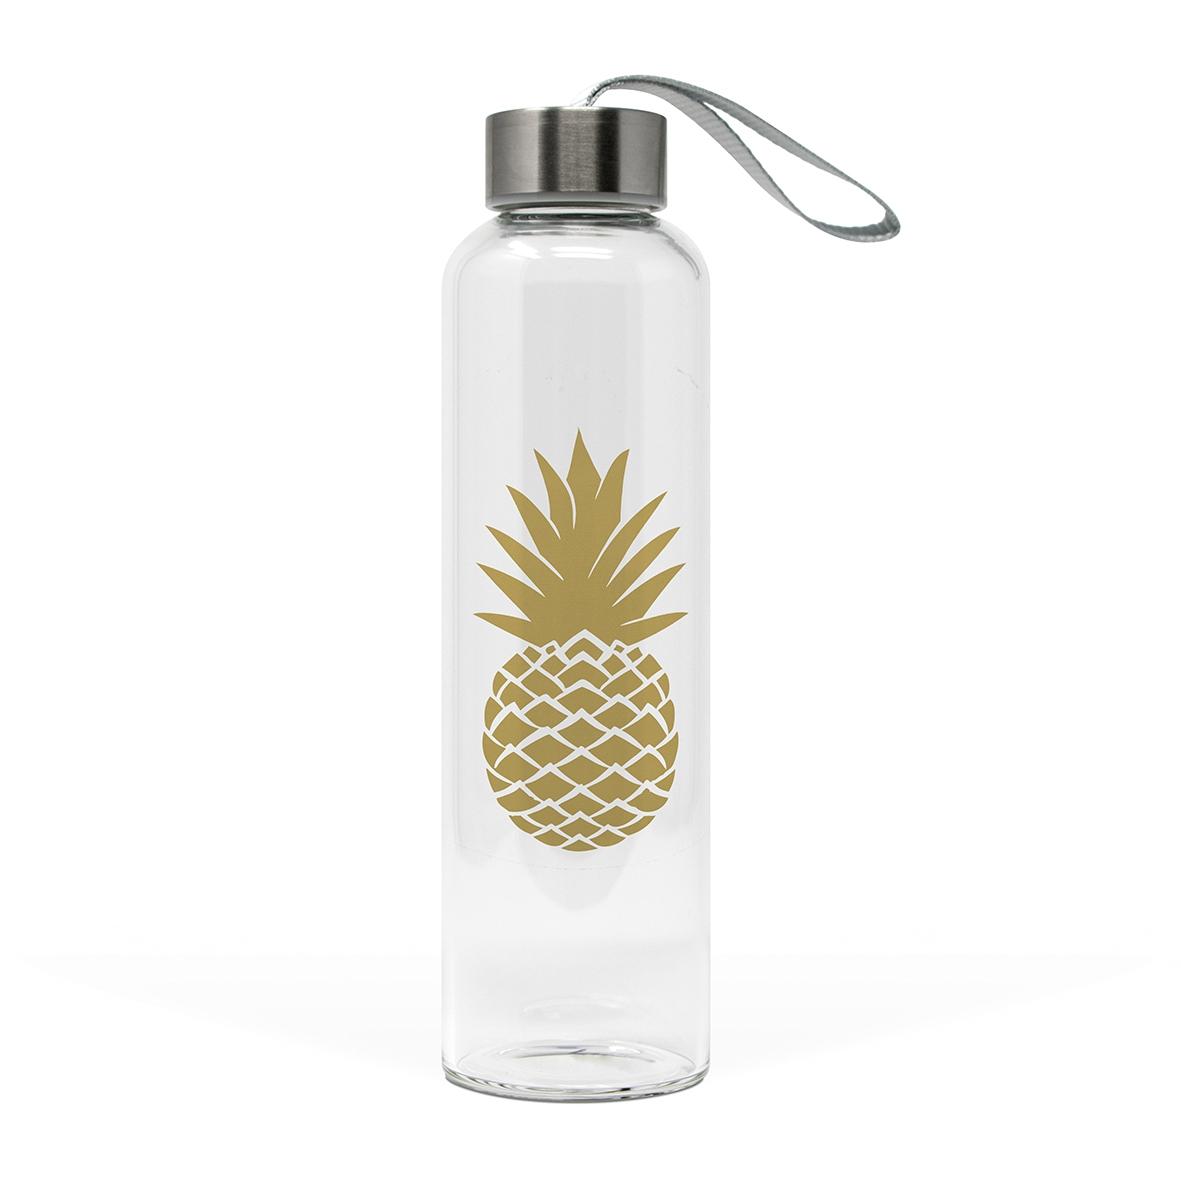 Glasflasche - Ananas echtes Gold